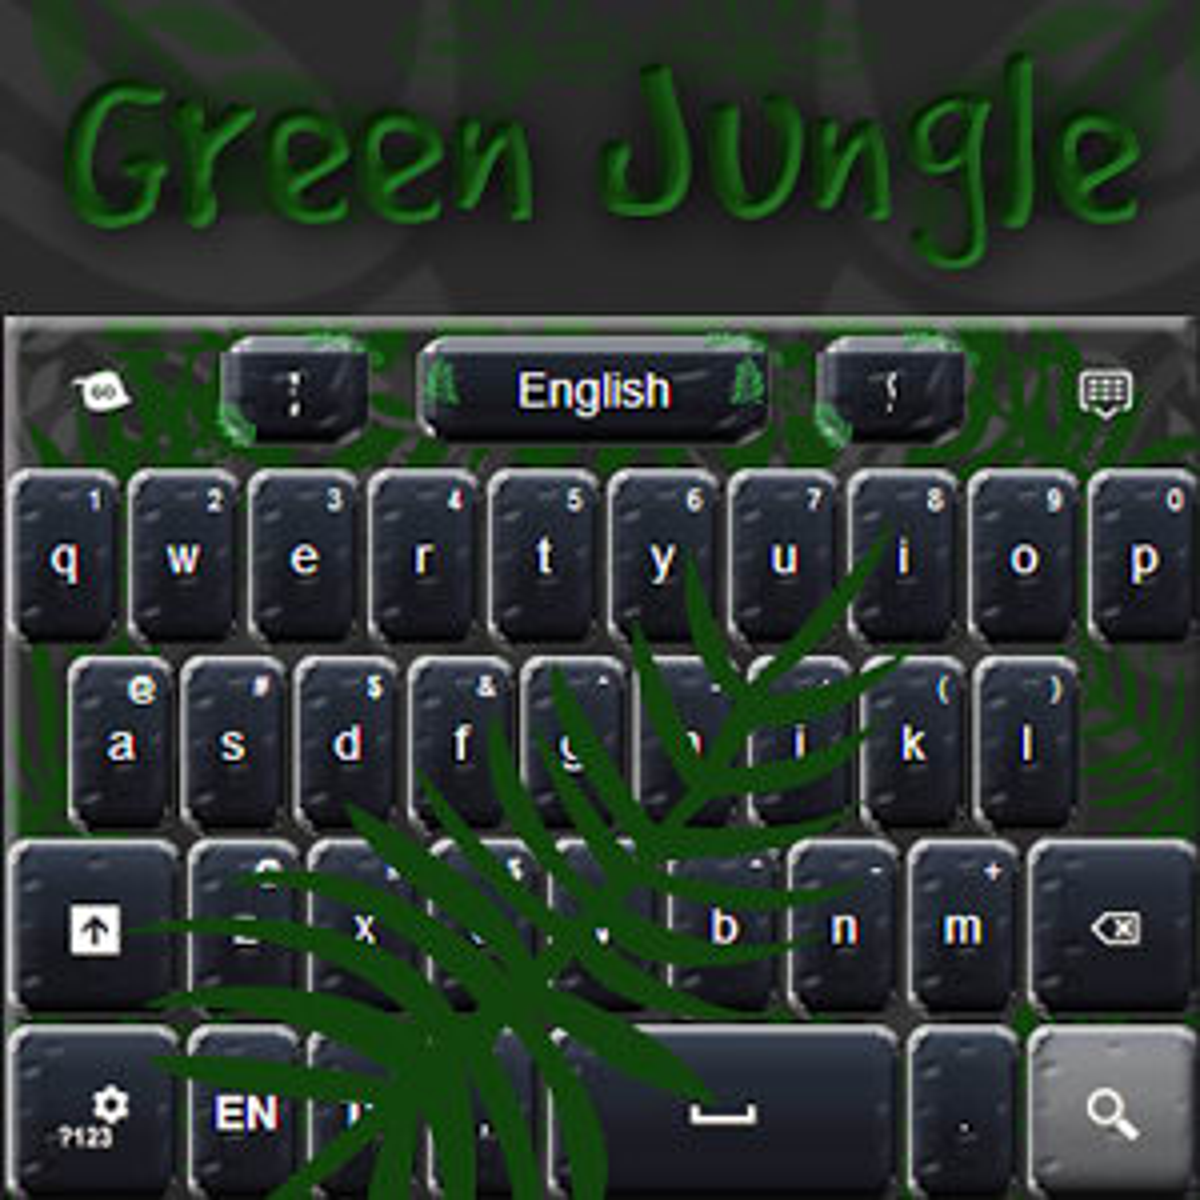 Teclado verde de la selva